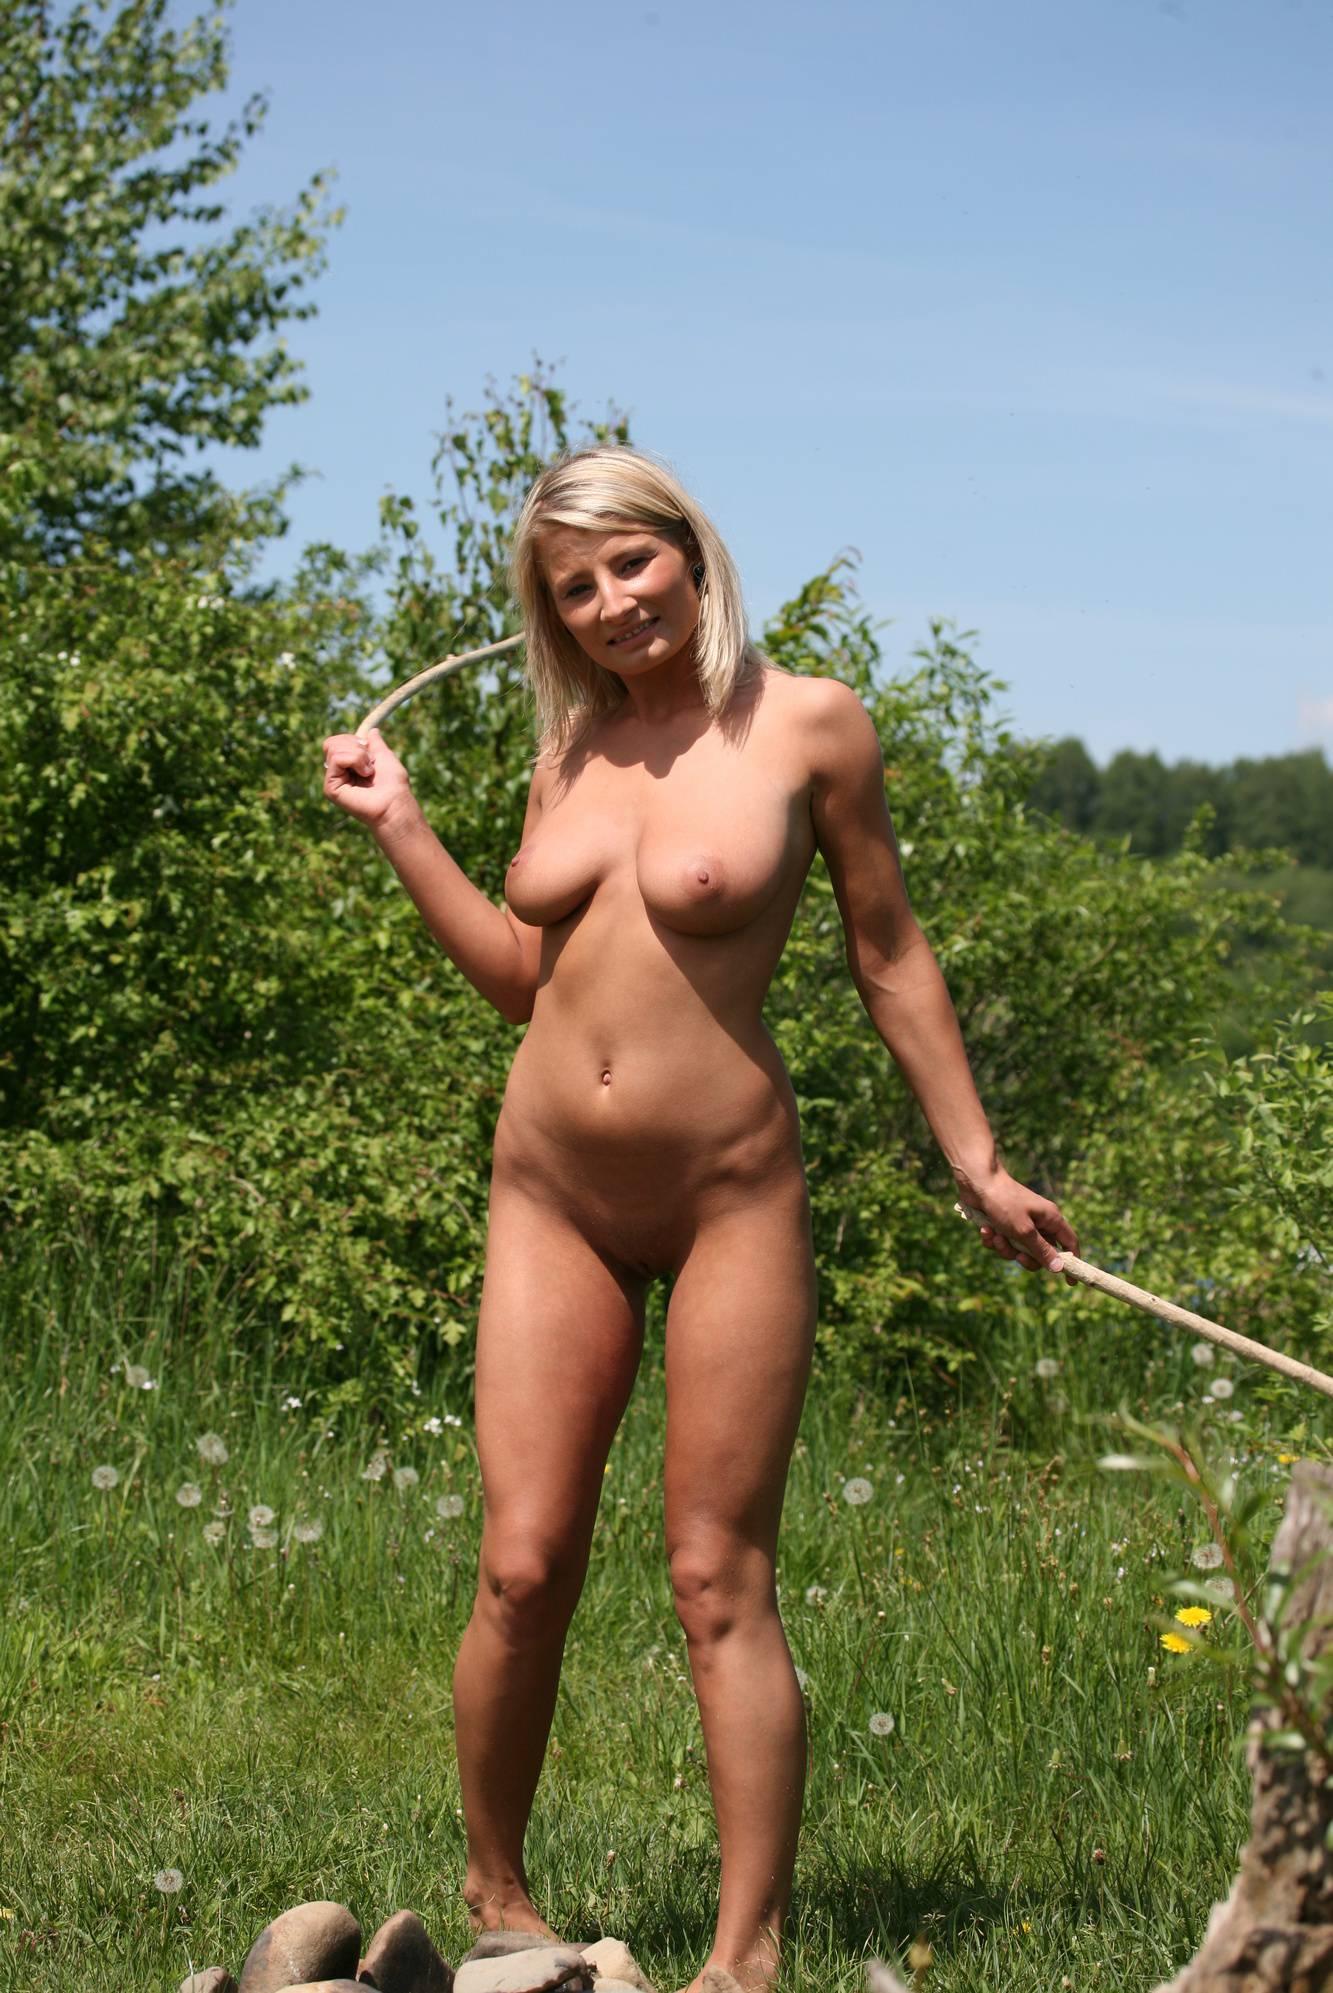 Pure Nudism Photos Seaworthy Nature Walk - 1